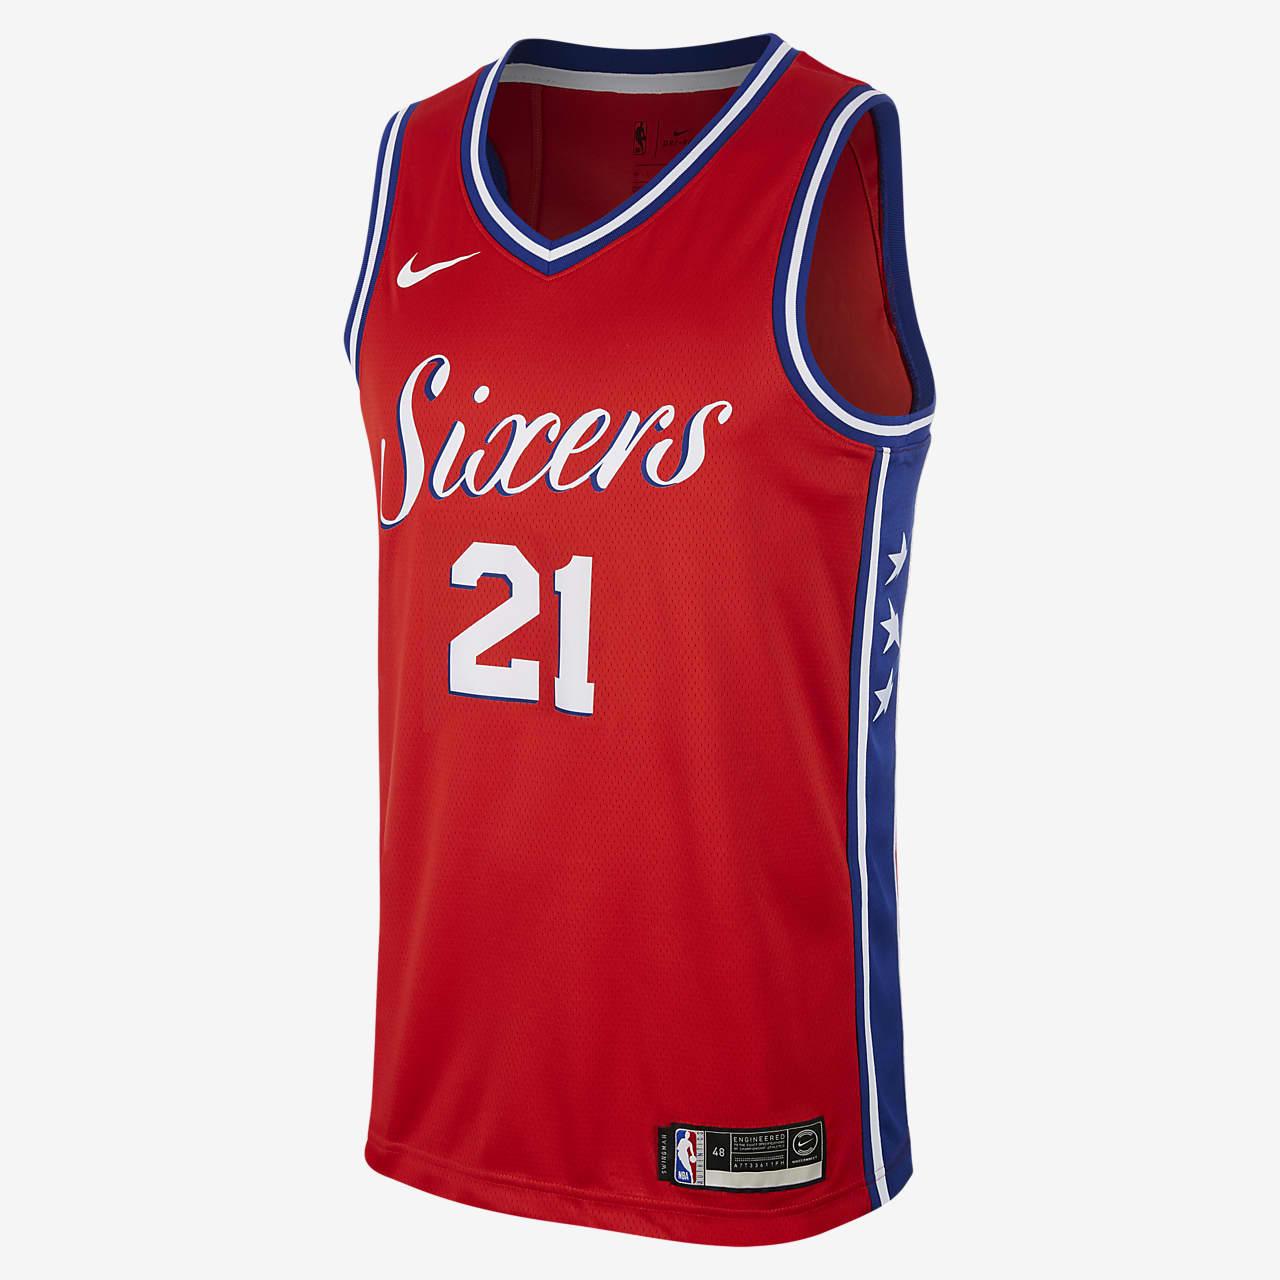 Joel Embiid 76ers Statement Edition Nike NBA Swingman Jersey